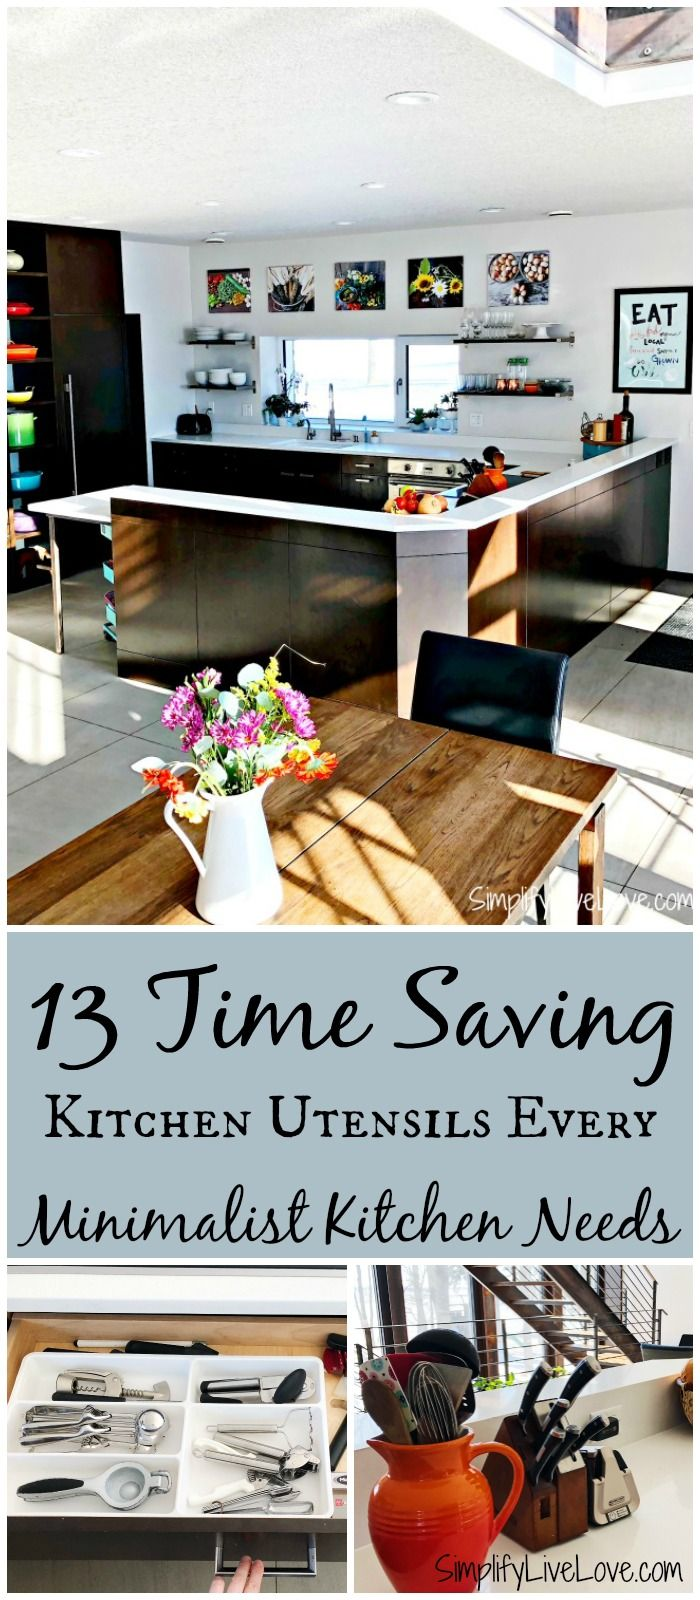 83 best Unique Useful Kitchen Ideas images on Pinterest | Home ...